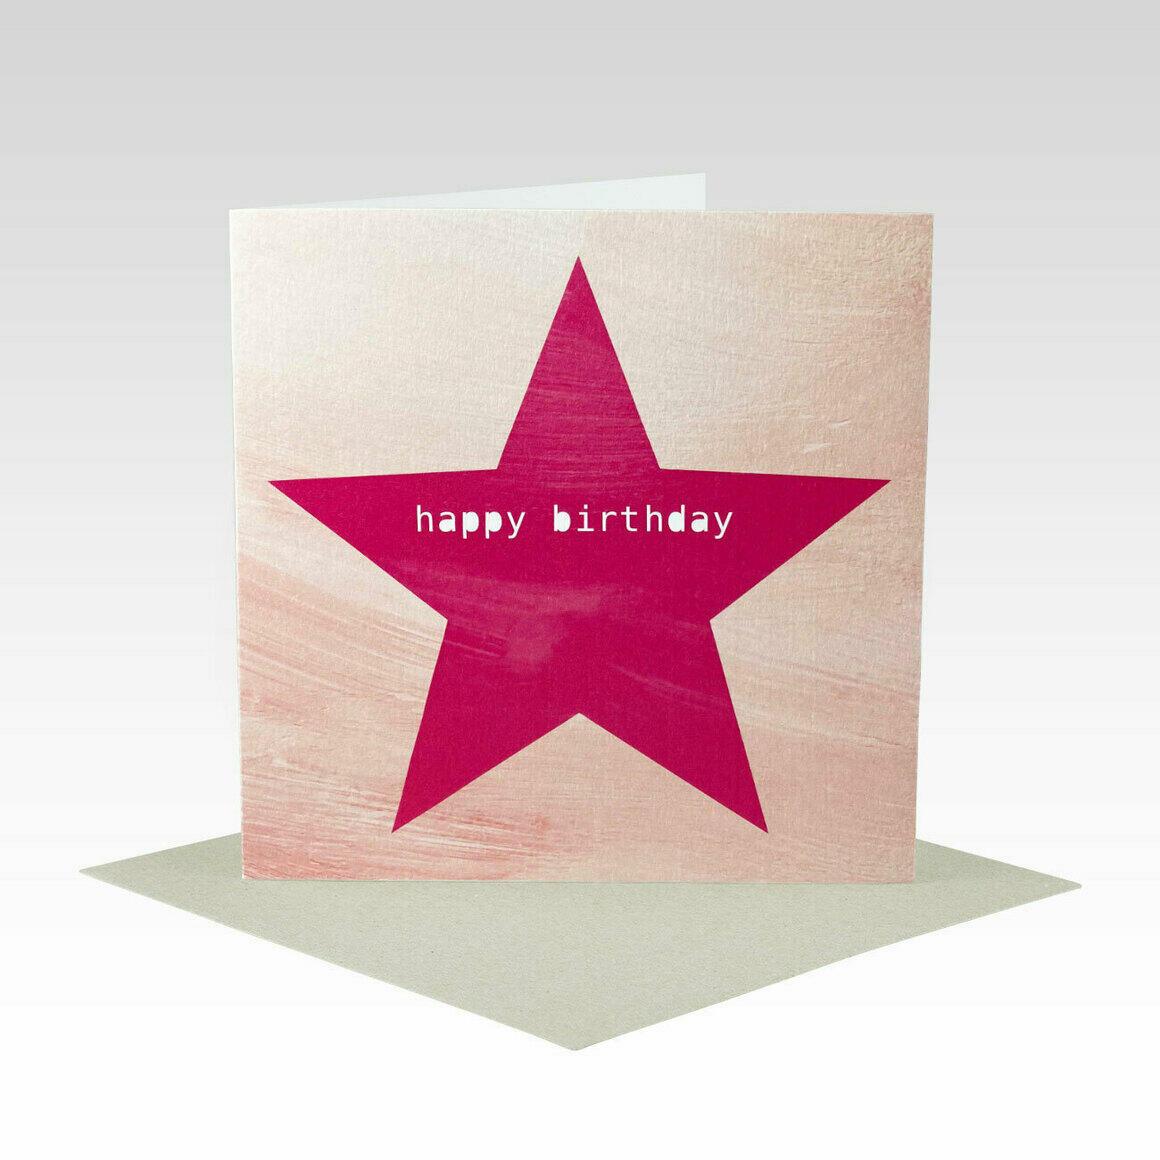 HB087 – Pink Peach Star Happy Birthday   Trada Marketplace